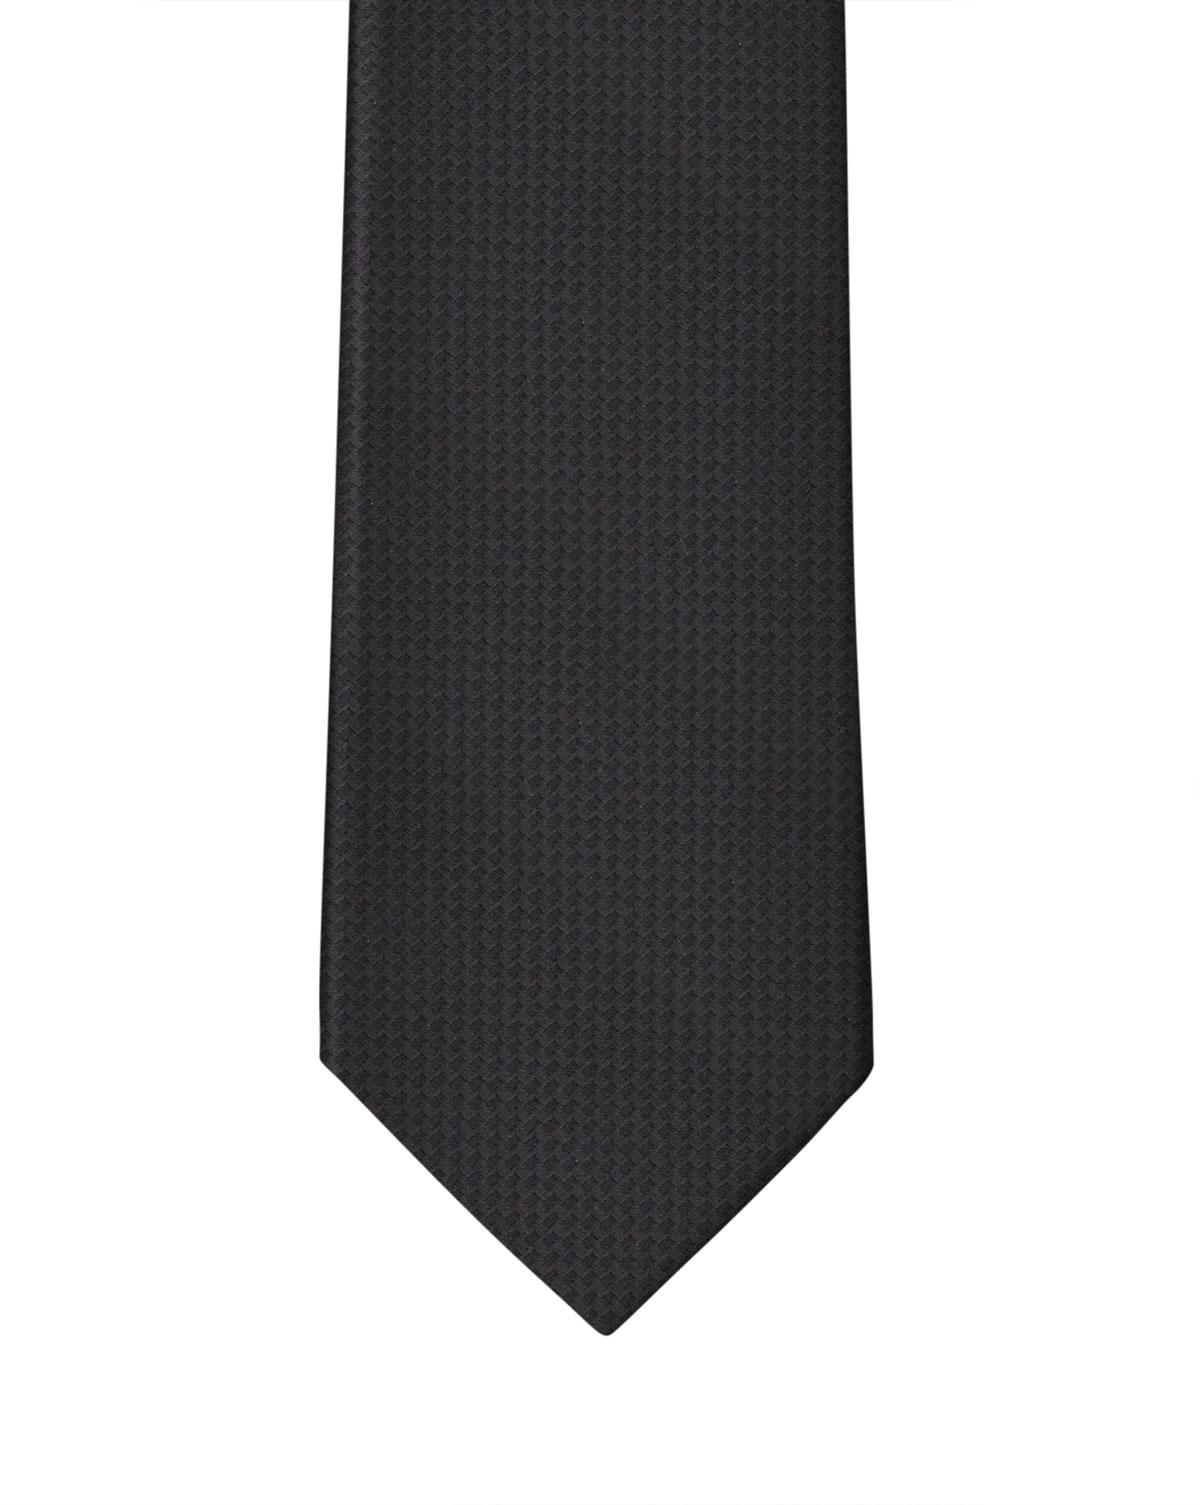 Black Solid Textured Waffle Weave Necktie